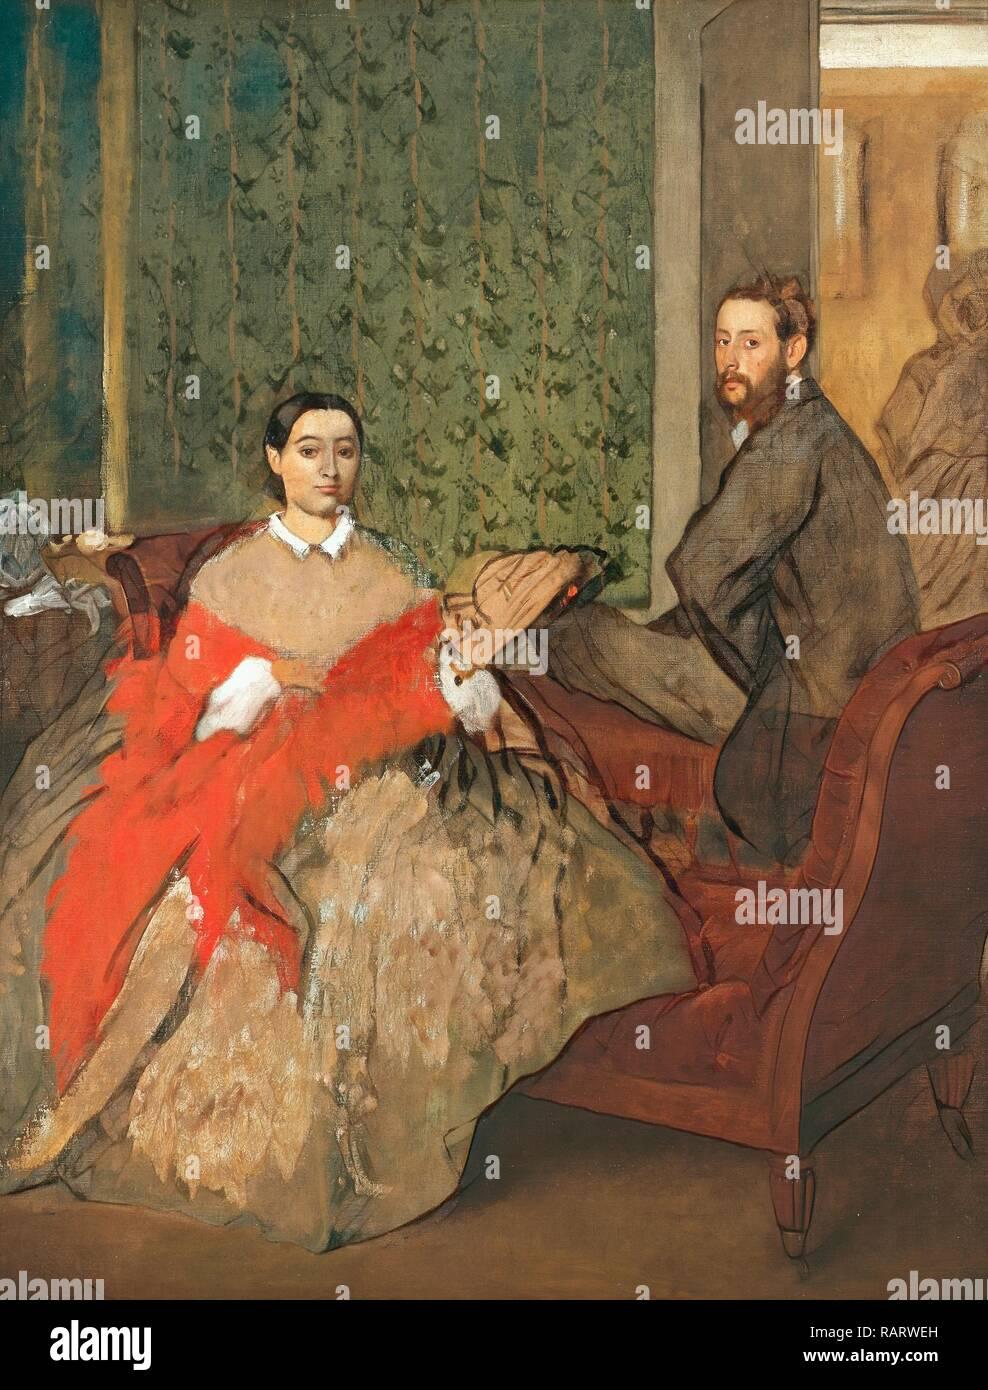 Edgar Degas (French, 1834-1917), Edmondo and Thérèse Morbilli, c. 1865, oil on canvas. Reimagined by Gibon. Classic reimagined Stock Photo